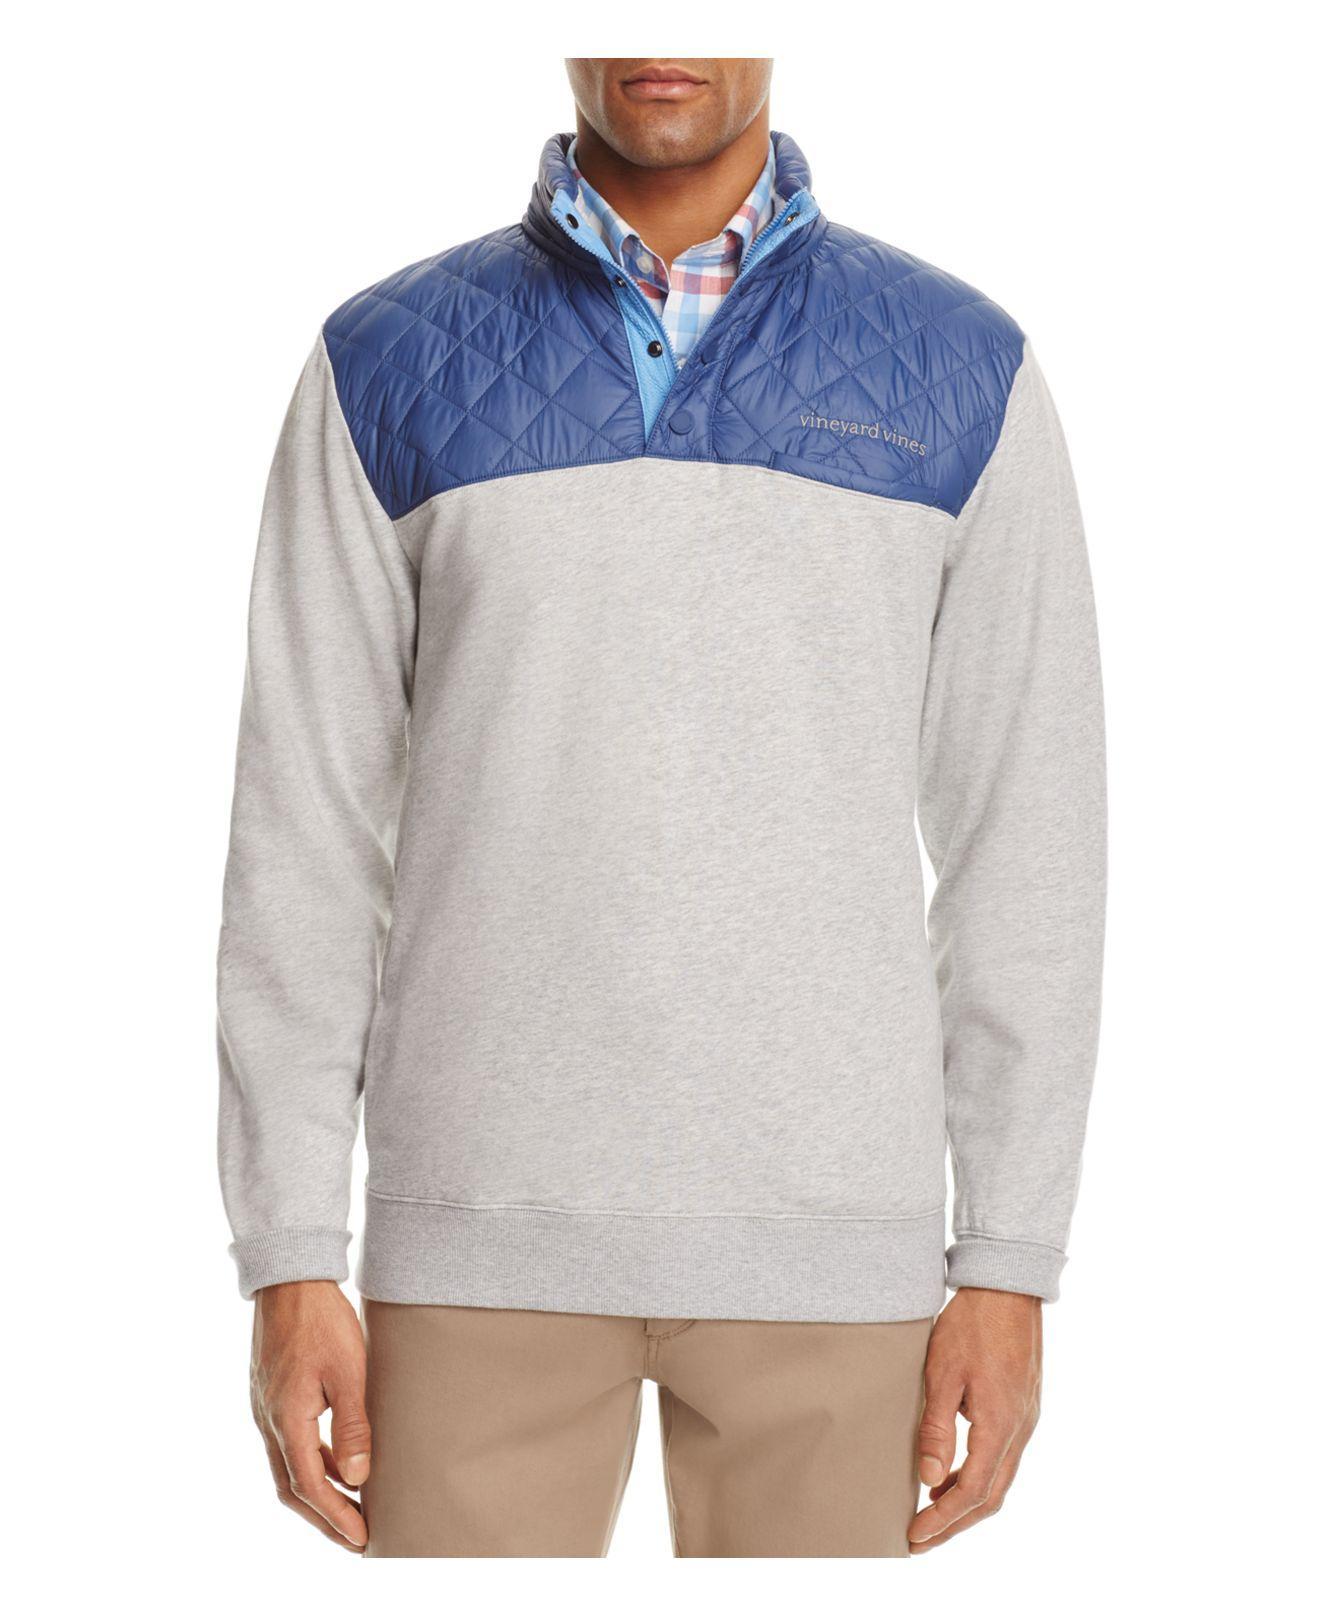 Vineyard Vines Quilted Shep Sweatshirt In Gray For Men Lyst